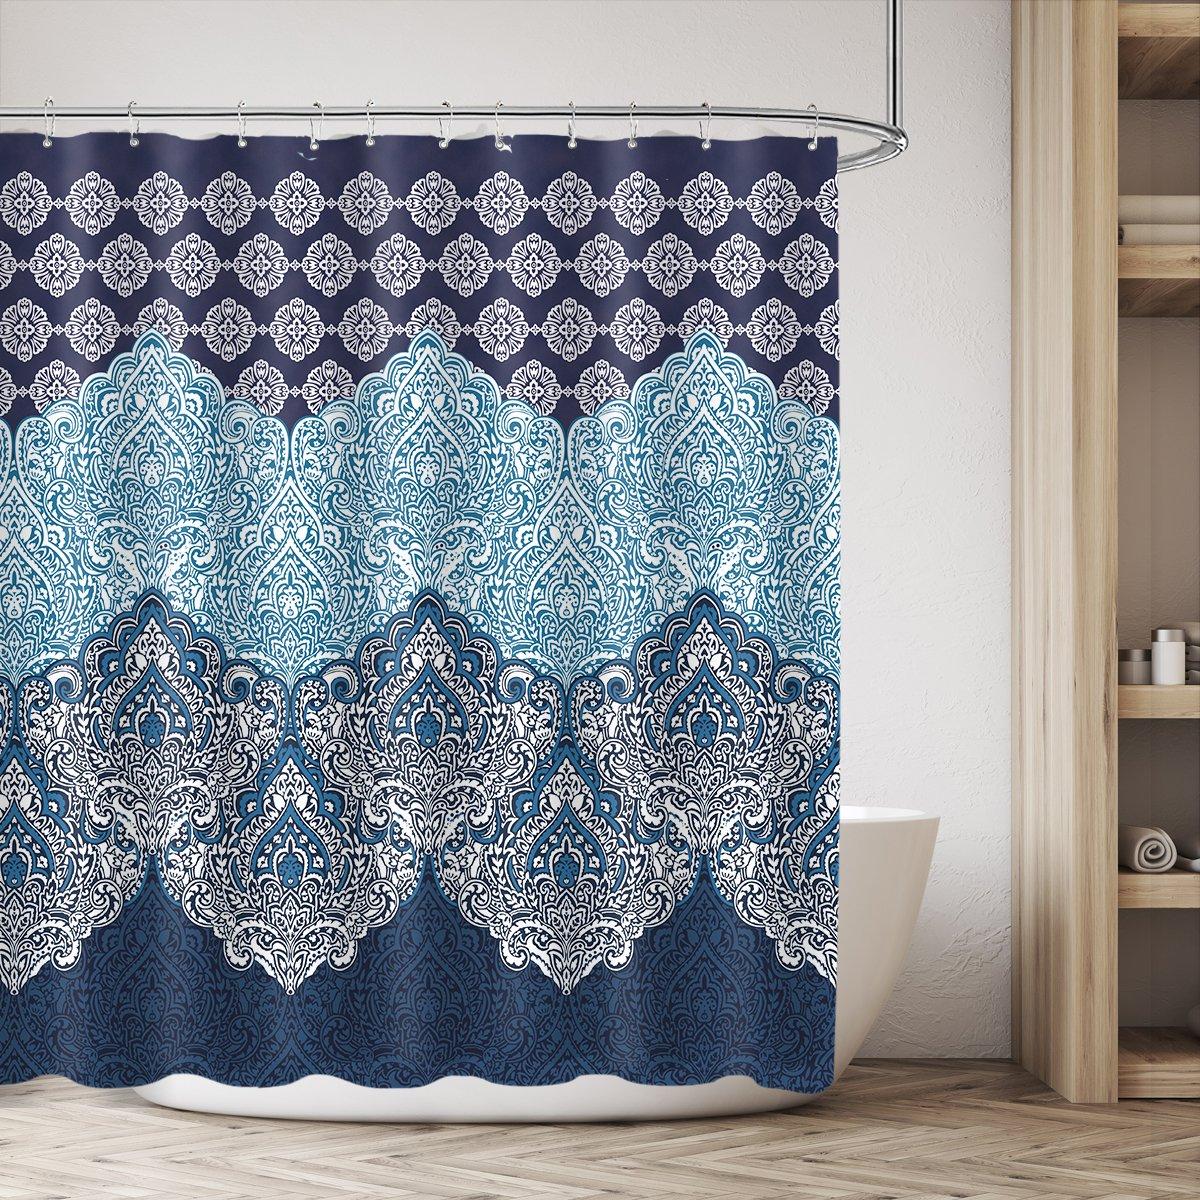 Cdcurtain Boho Paisley Shower Curtain Panel Free Metal Hooks 12-Pack Floral India Bohemia Dark Navy Shower Curtain Panel Polyester Waterproof Fabric Clawfoot Tub 72x72 Inch by Cdcurtain (Image #1)